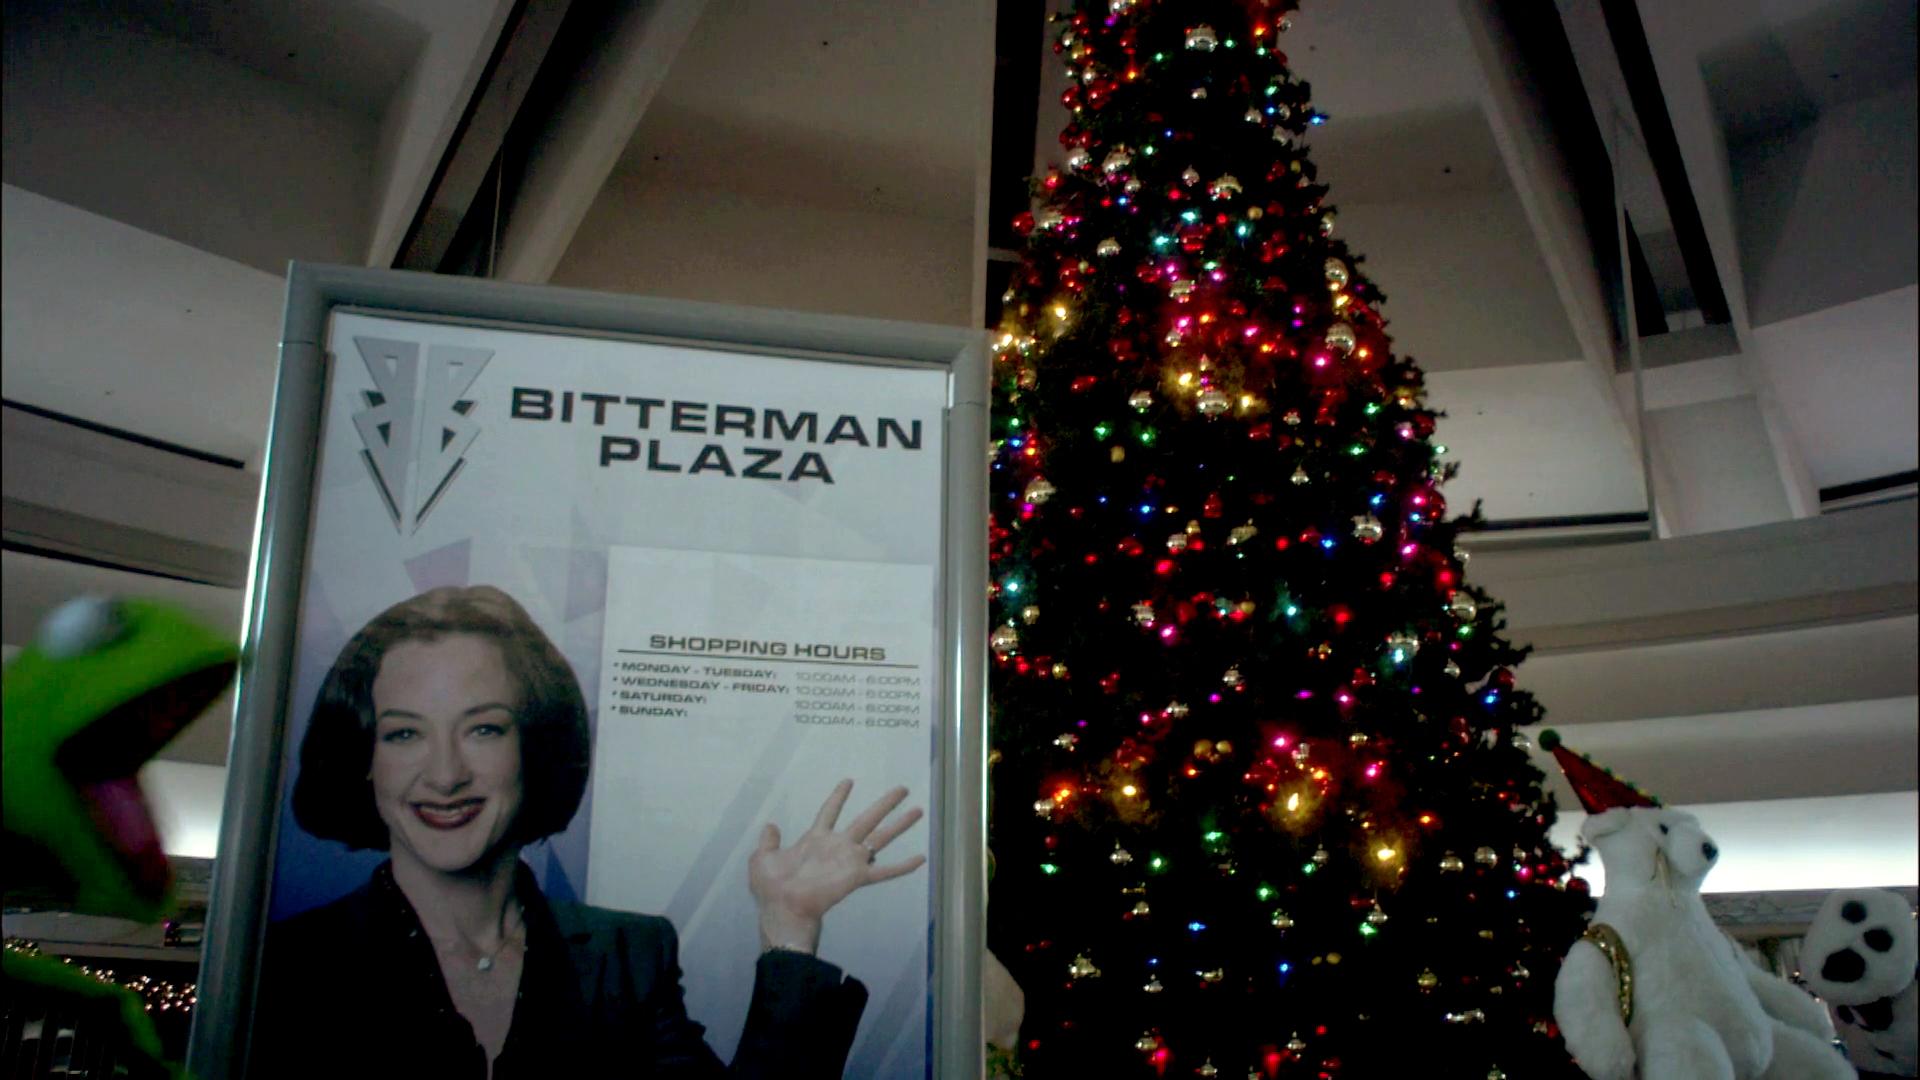 File:Bitterman Plaza Sign.jpg